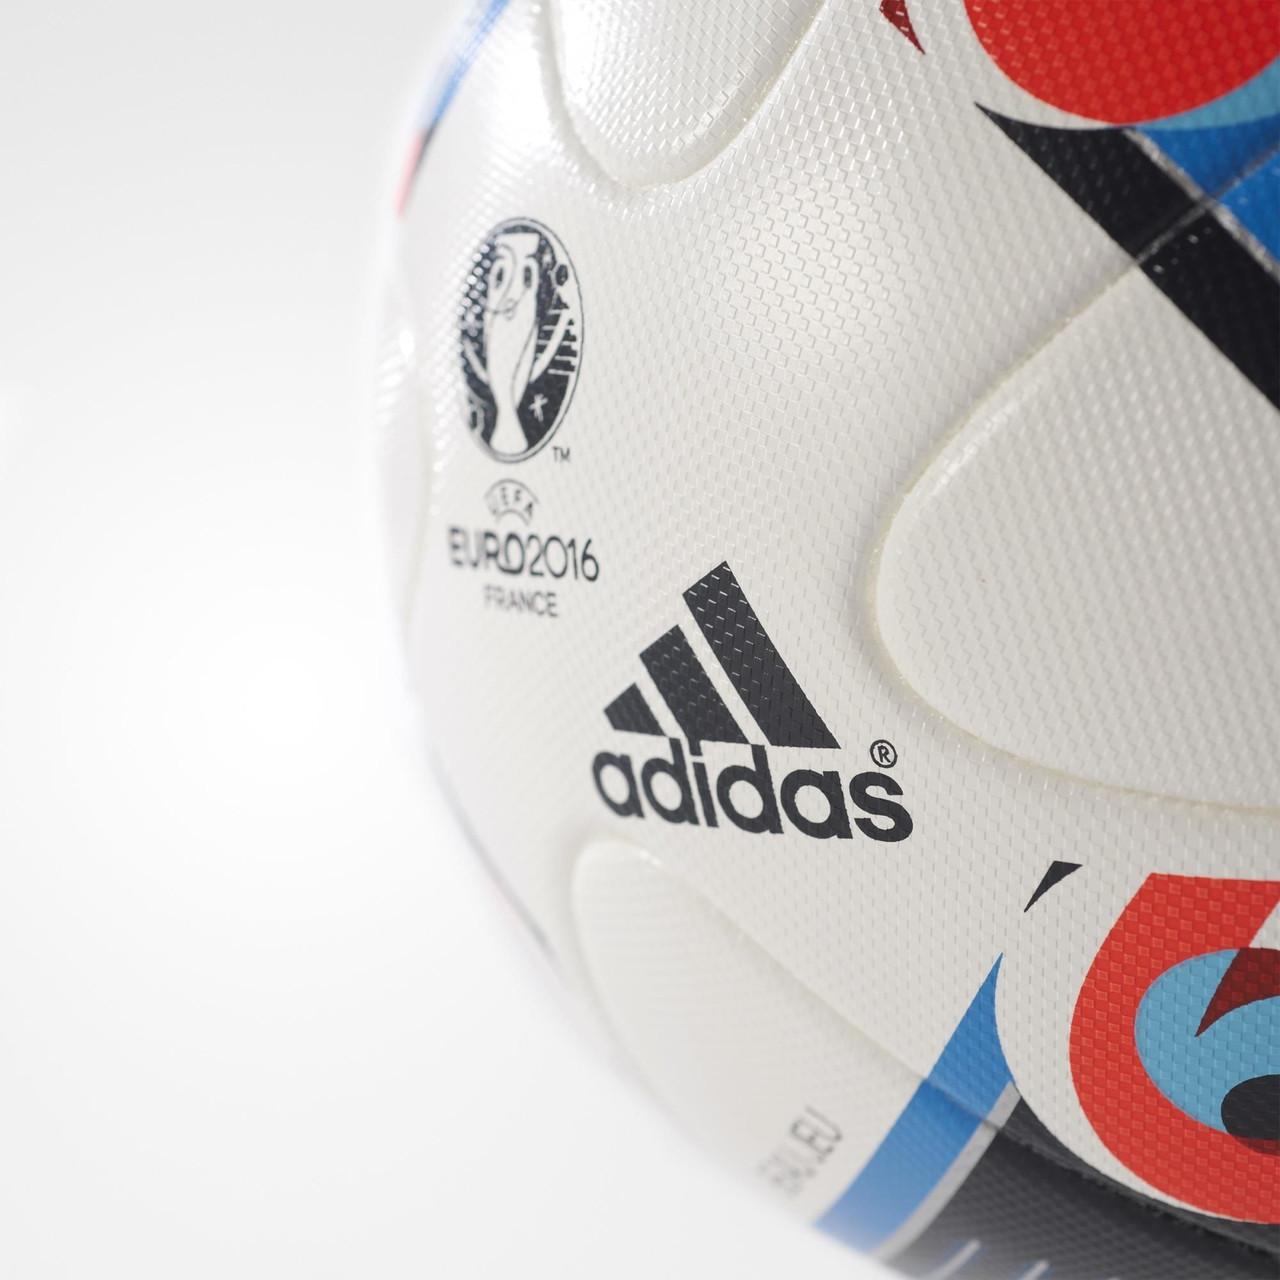 Купить Мяч евро UEFA EURO 2016 OMB (Артикул  AC5415) в интернет ... 05dd49305547f